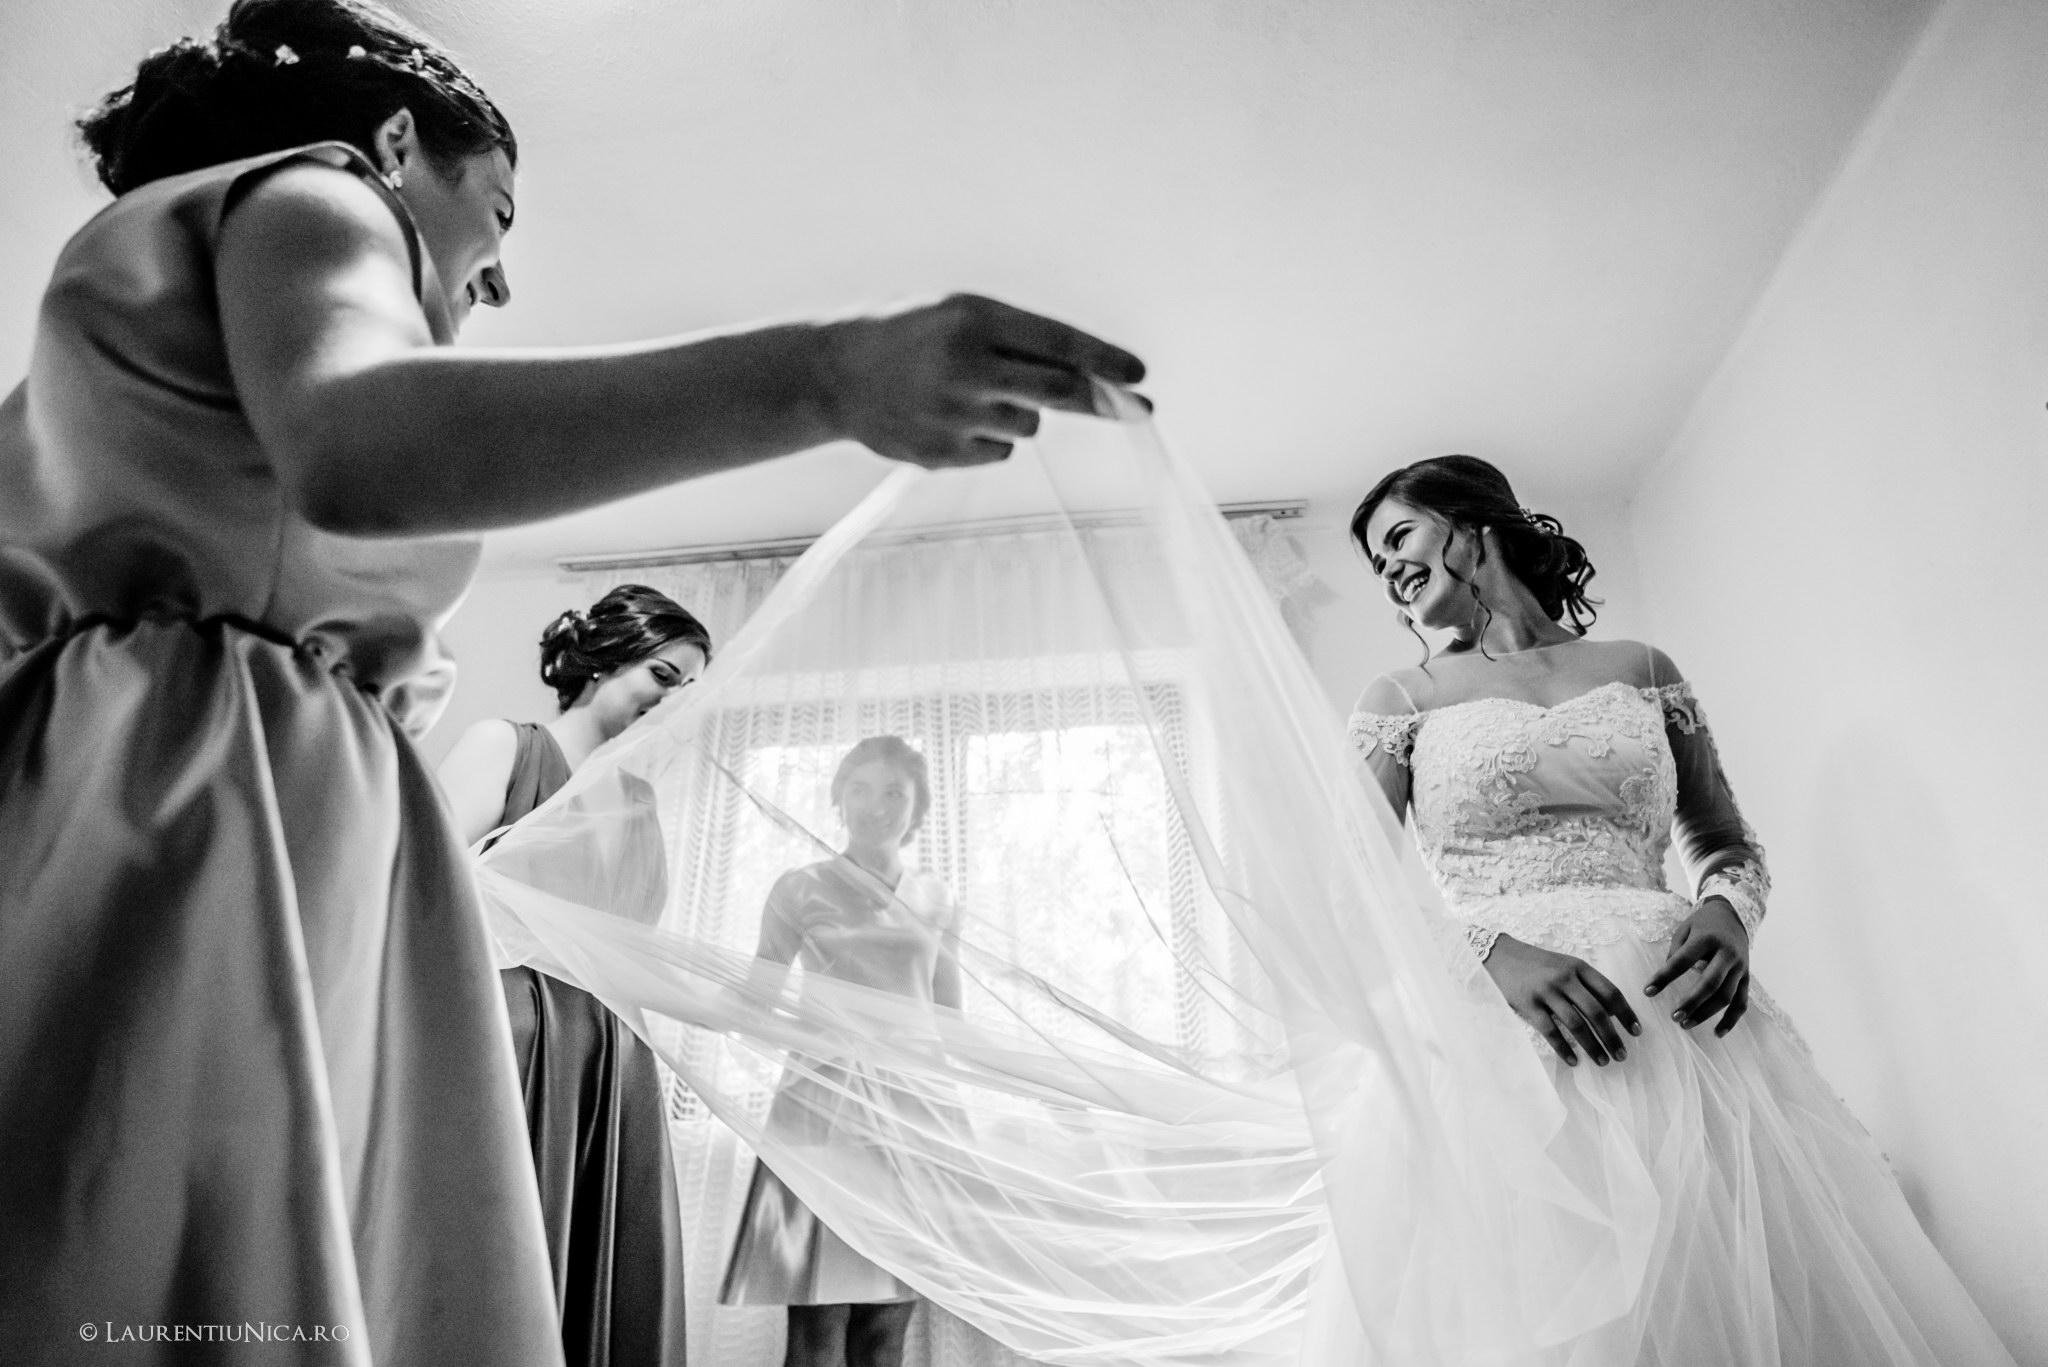 Alina si Andrei fotograf nunta laurentiu nica craiova 22 - Alina & Andrei | Fotografii nunta